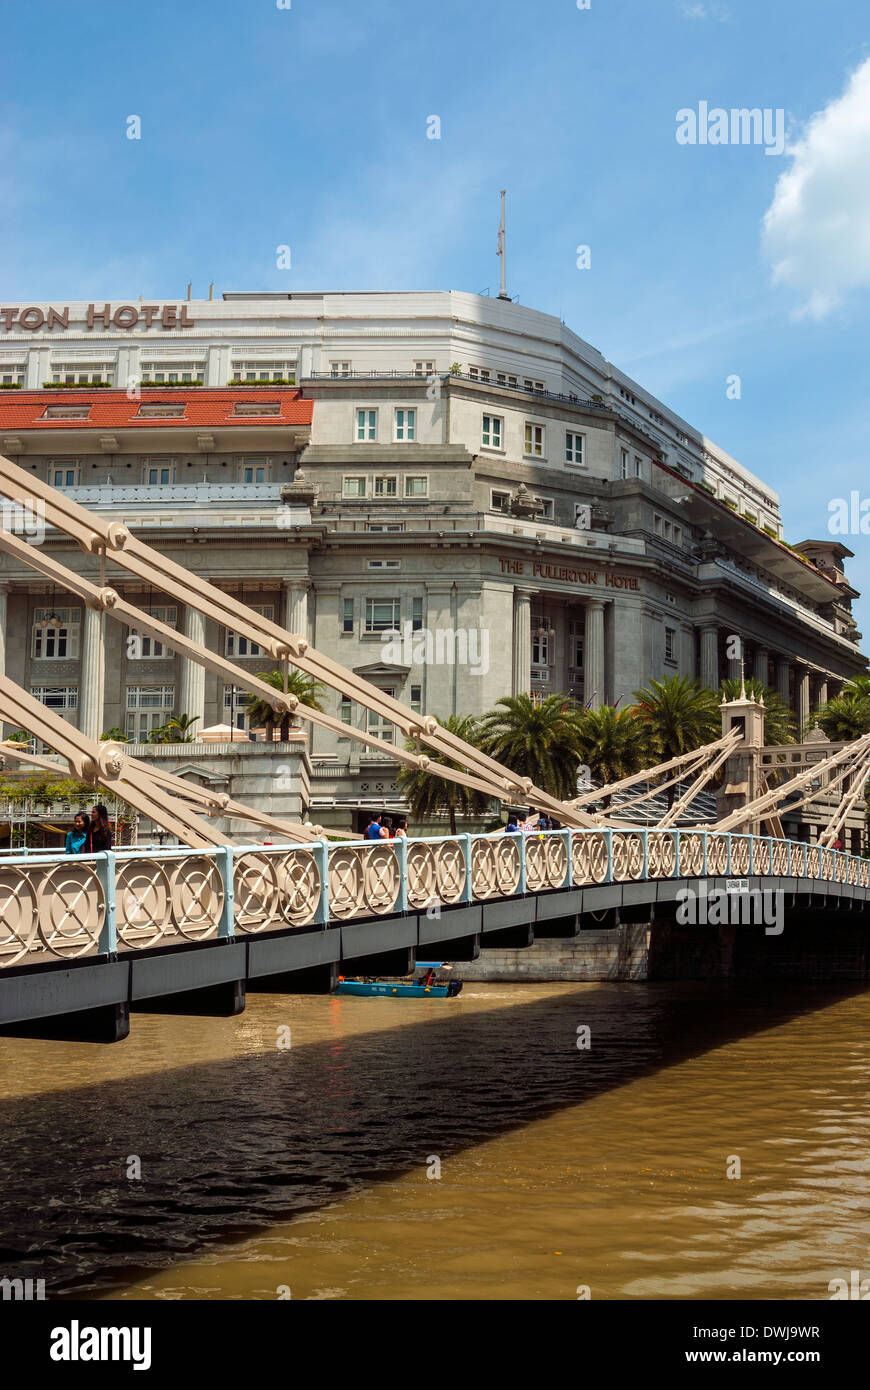 The Fullerton Hotel and Cavenagh Bridge, Singapore - Stock Image